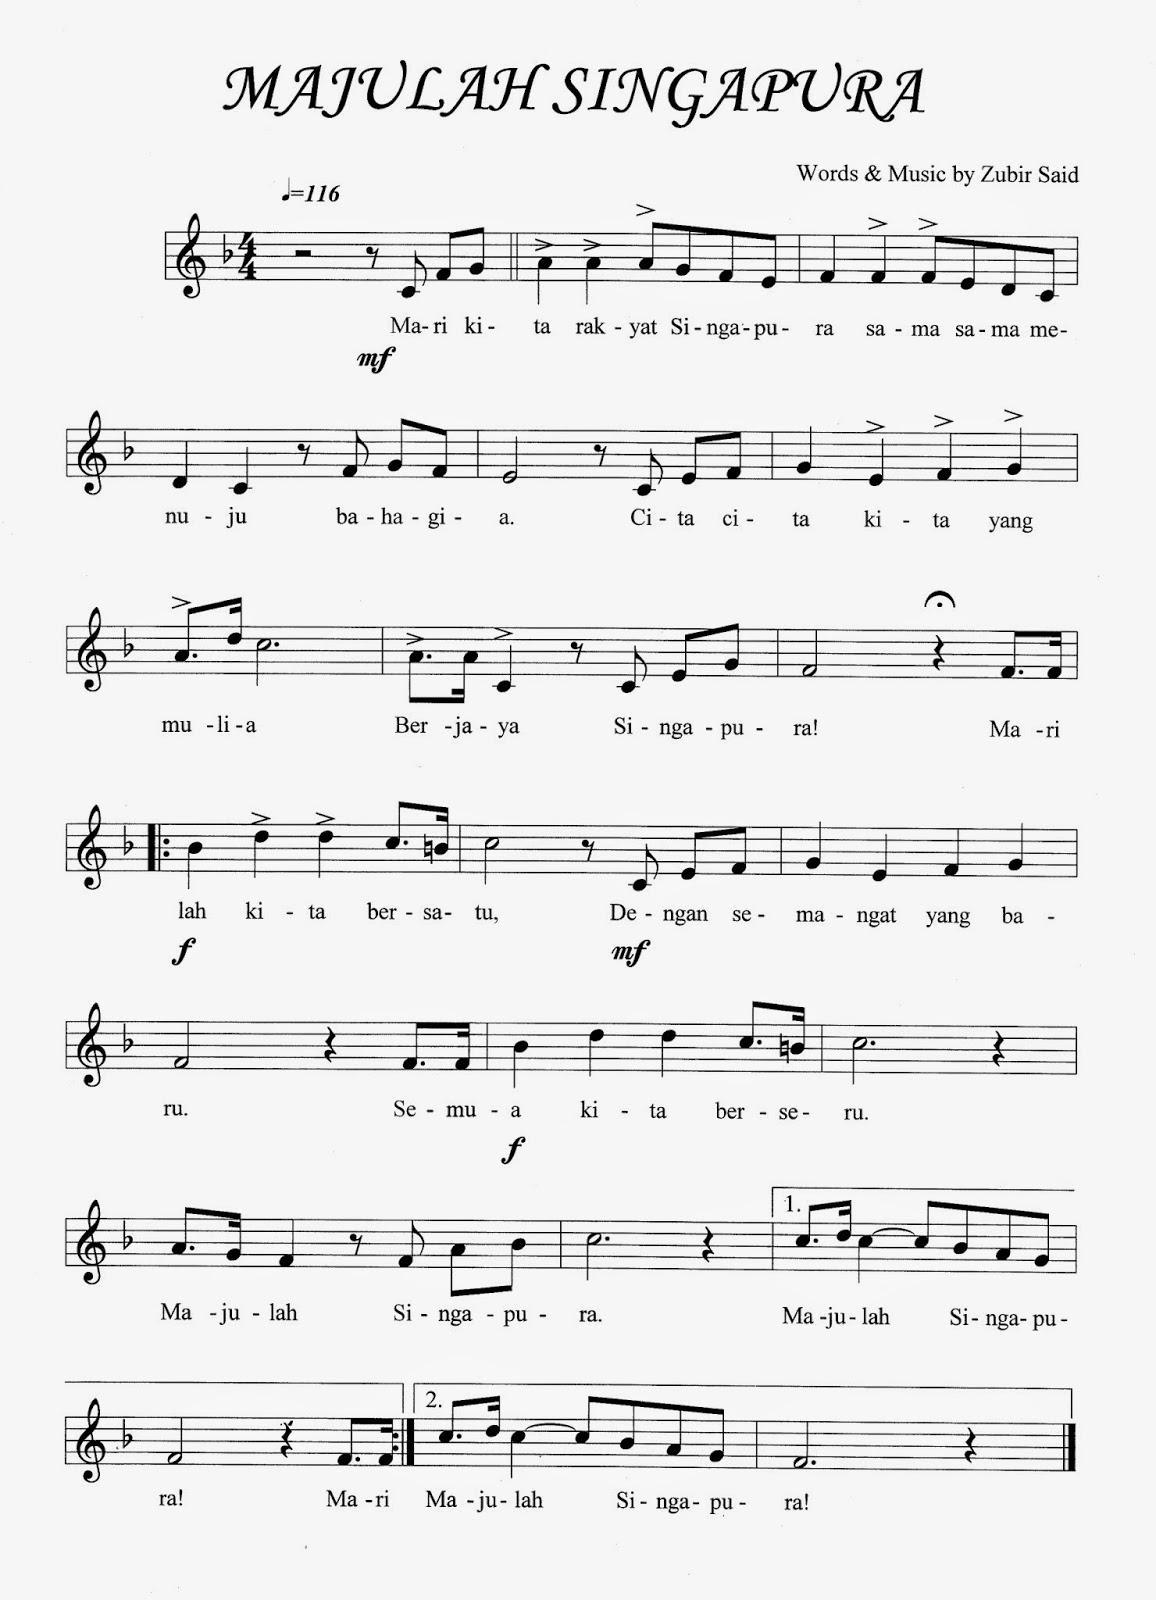 malay words - majulah singapura lyrics